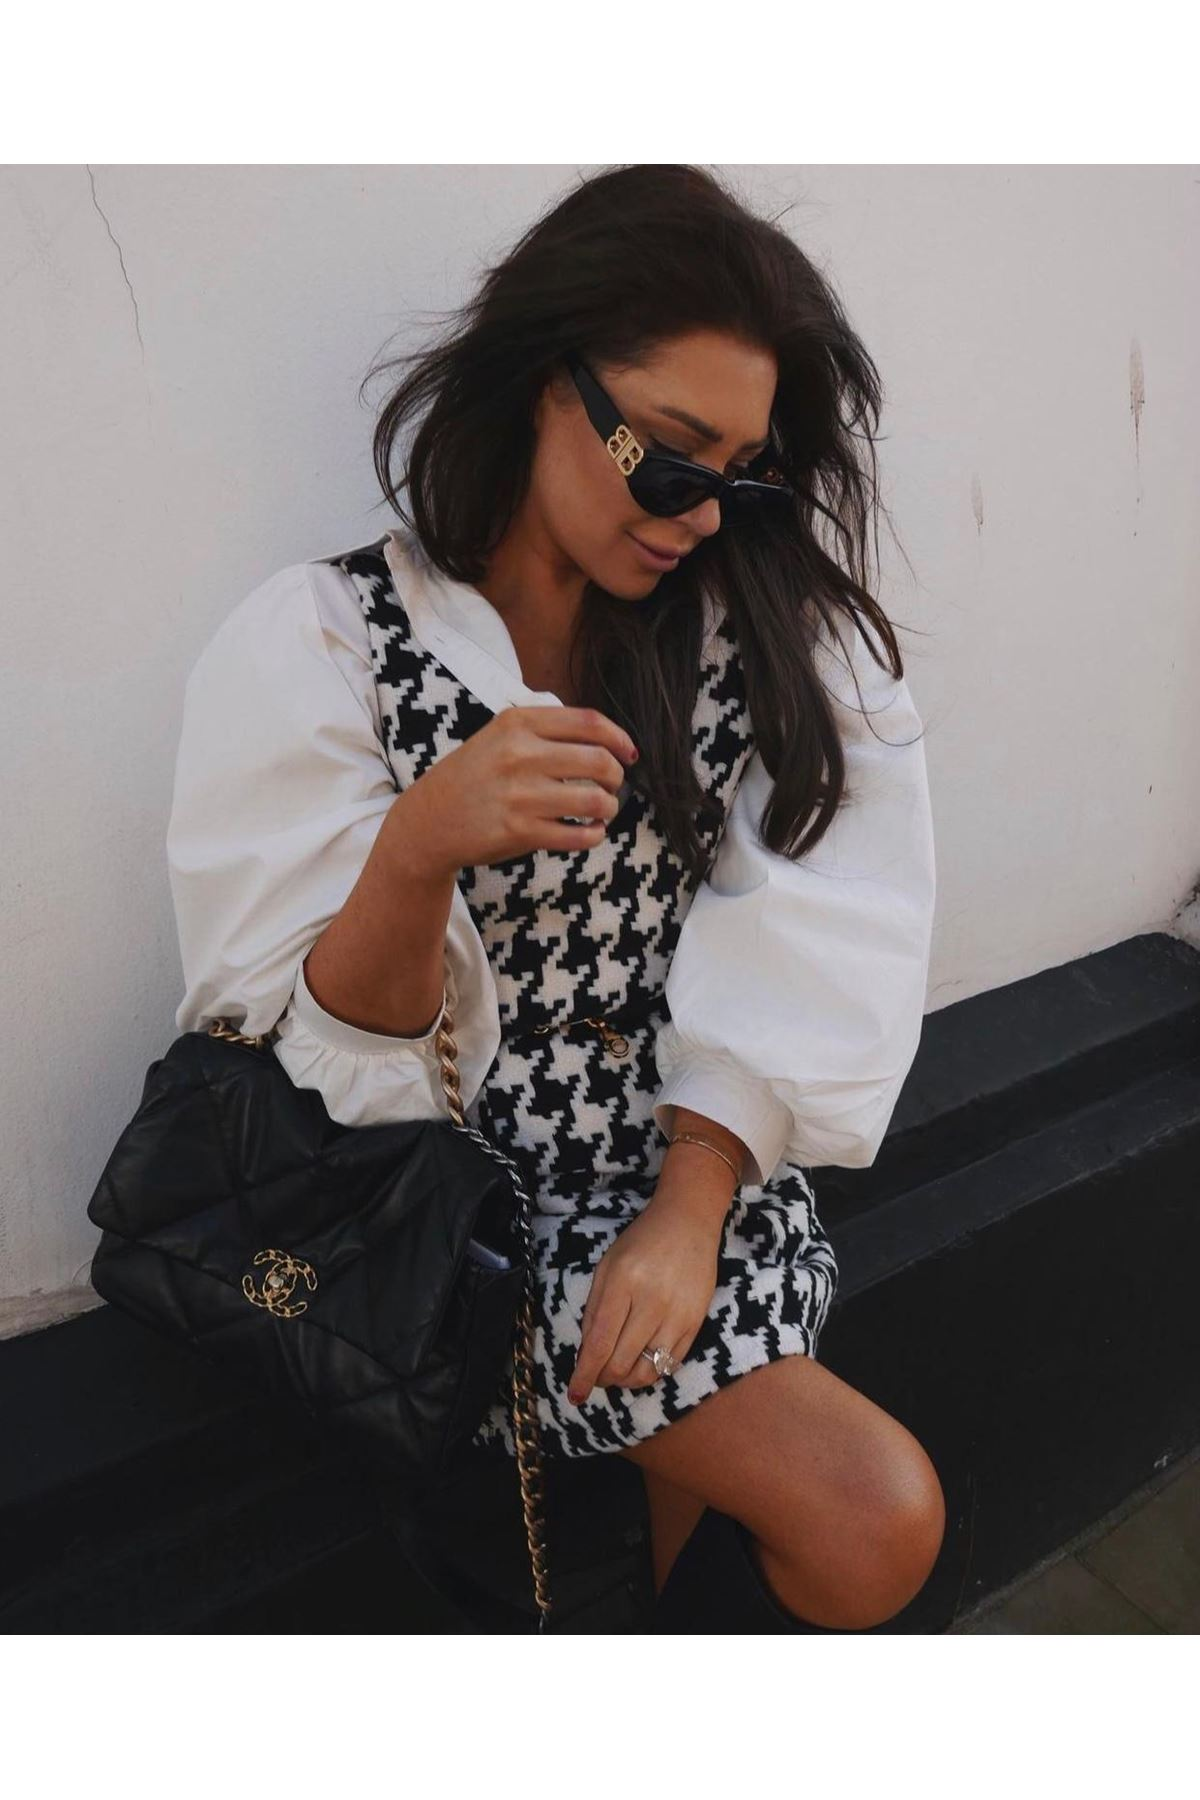 İthal Kaşe Kumaş Kollar Poplin Detay Elbise - MULTİ